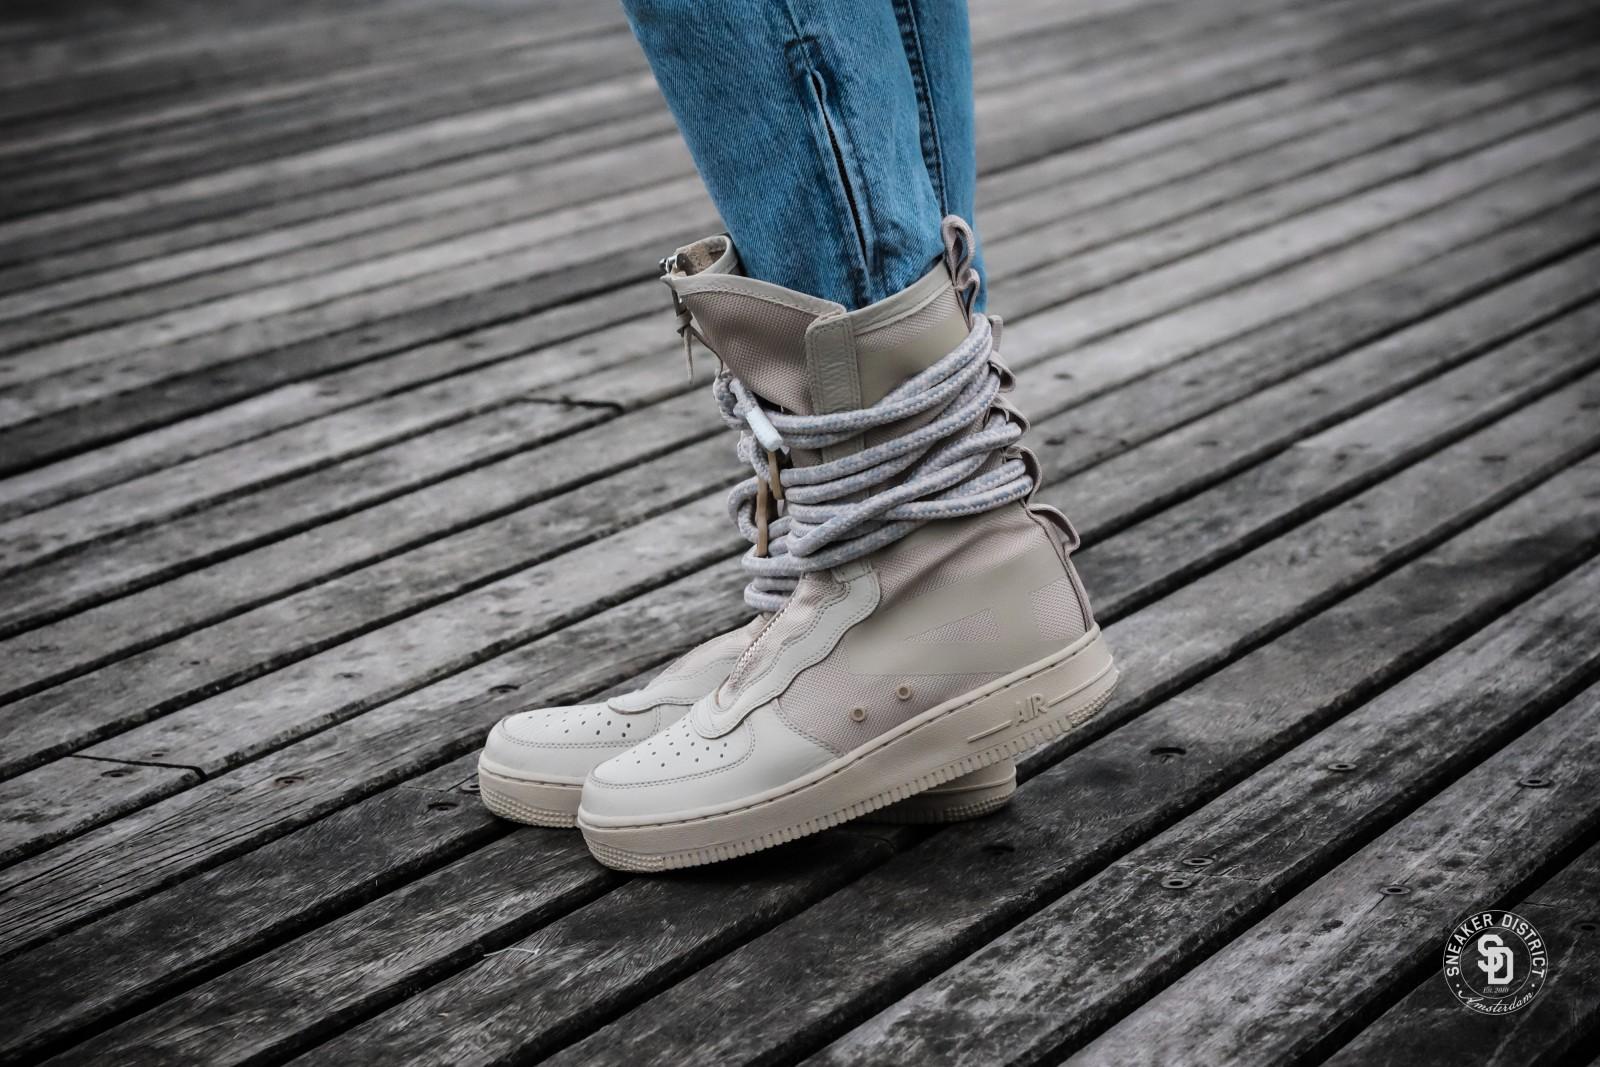 Nike SF Air Force 1 Women Shoes Good Sale, Nike Women Boots